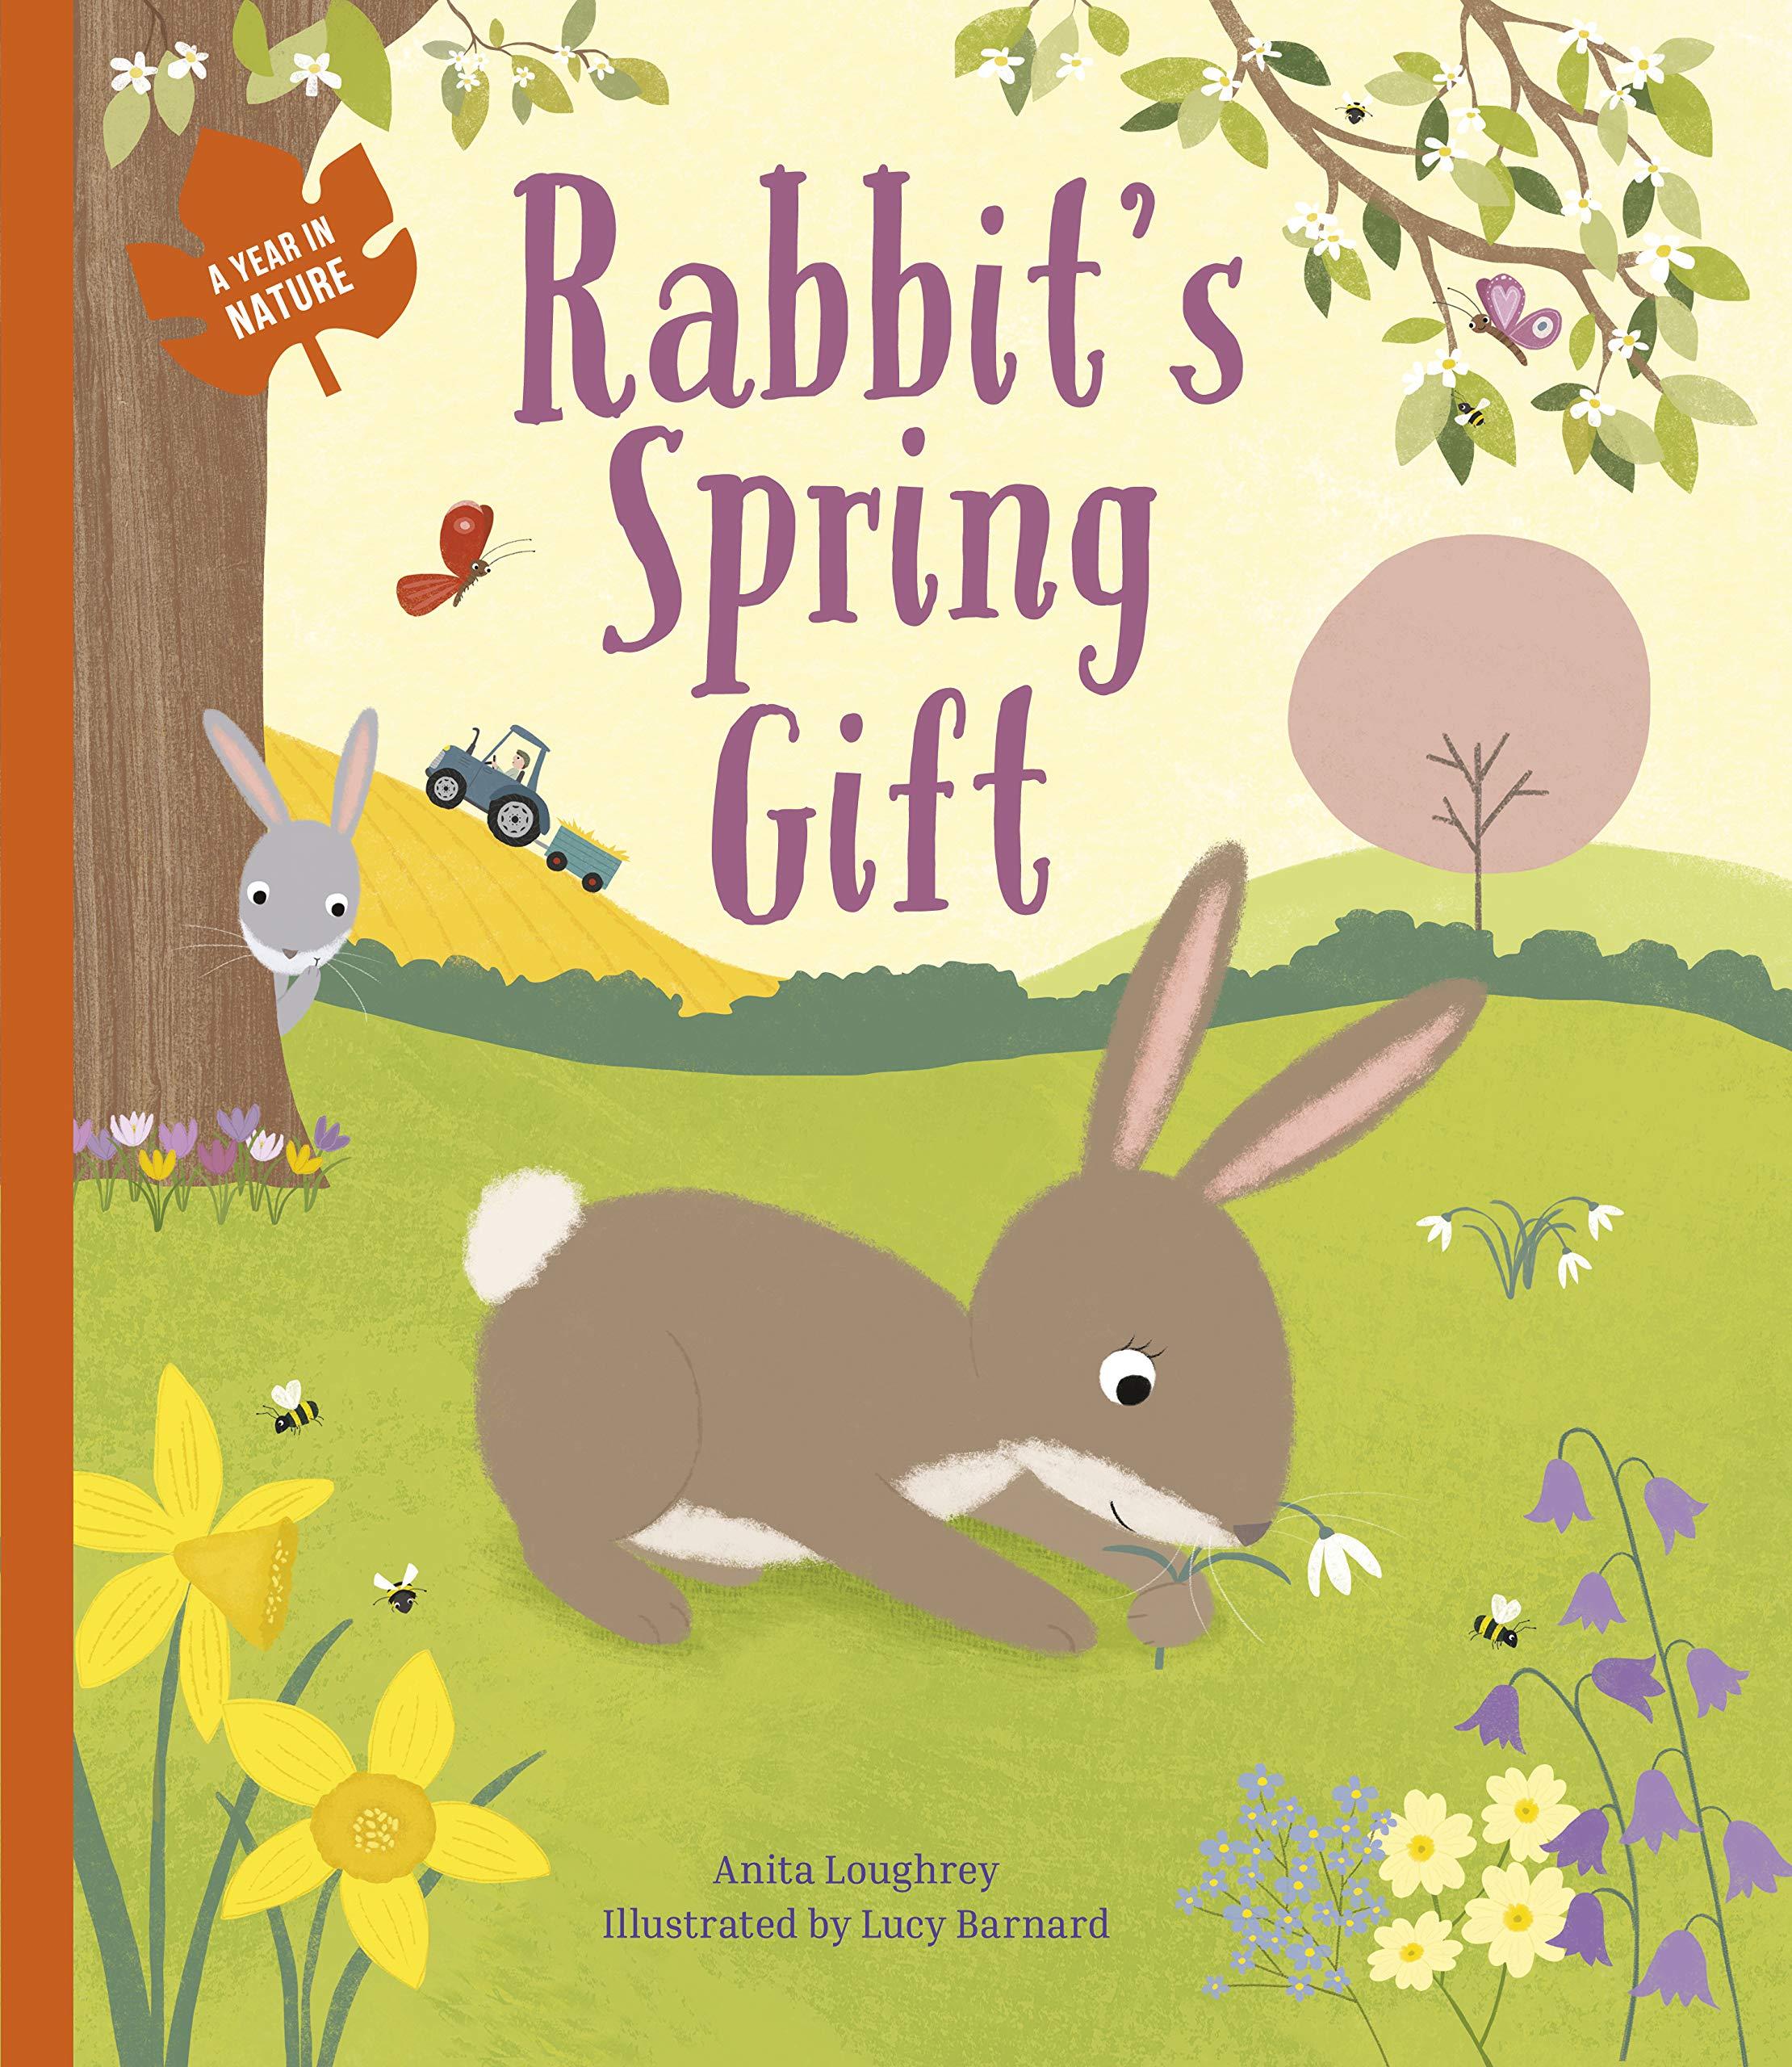 Rabbits Spring Gift